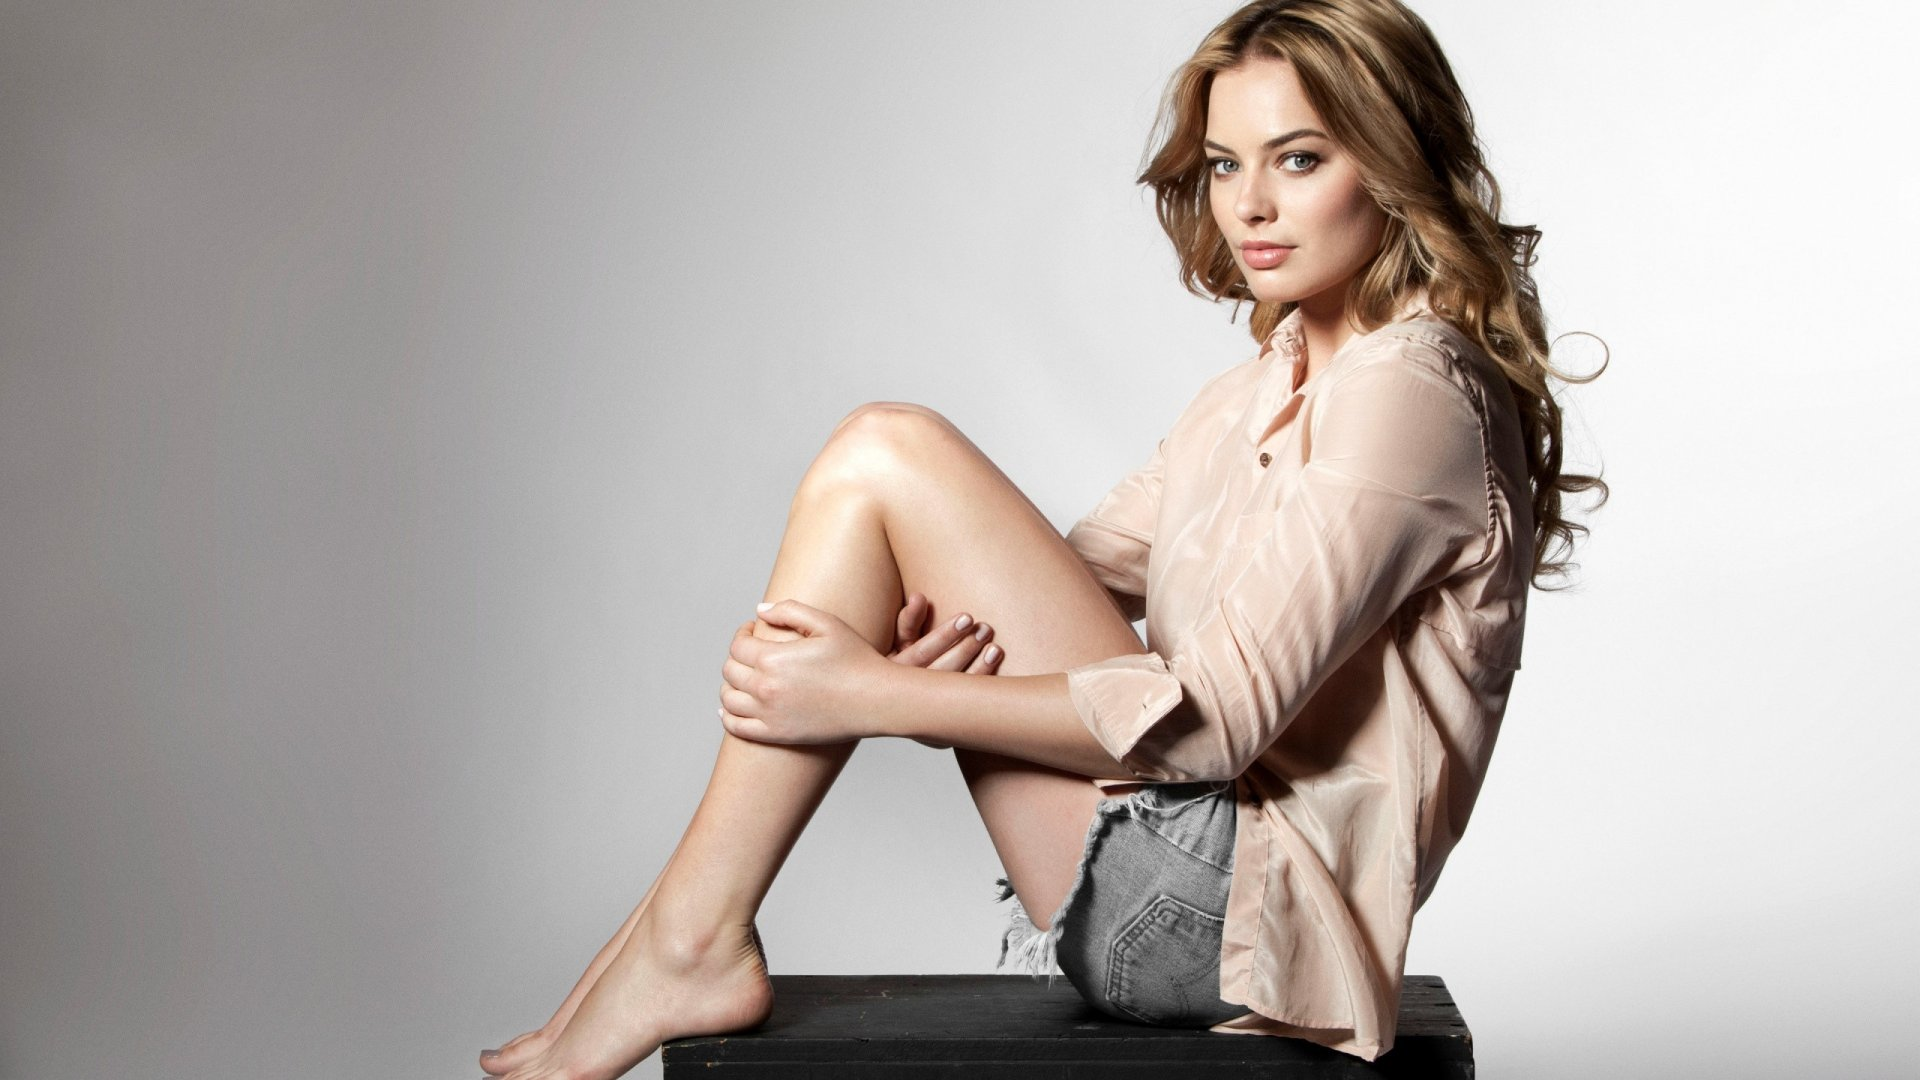 Actriz Margot Robbie Castaña Fondo De Pantalla 2k Quad Hd Id